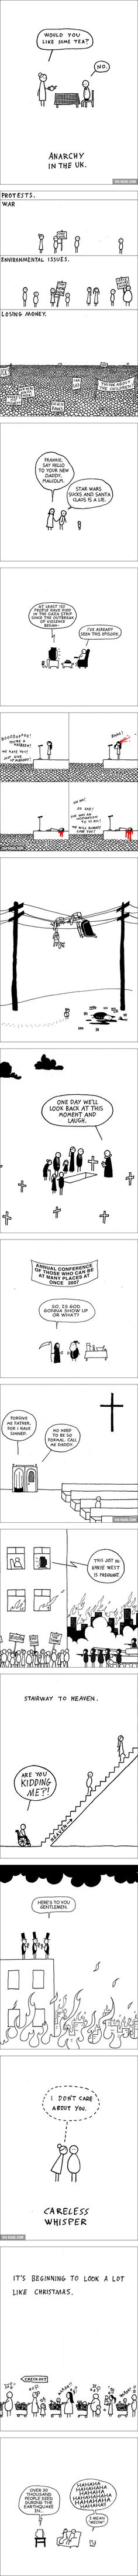 The 15 Best Dark Humor Cartoons by Hugleikur Dagsson